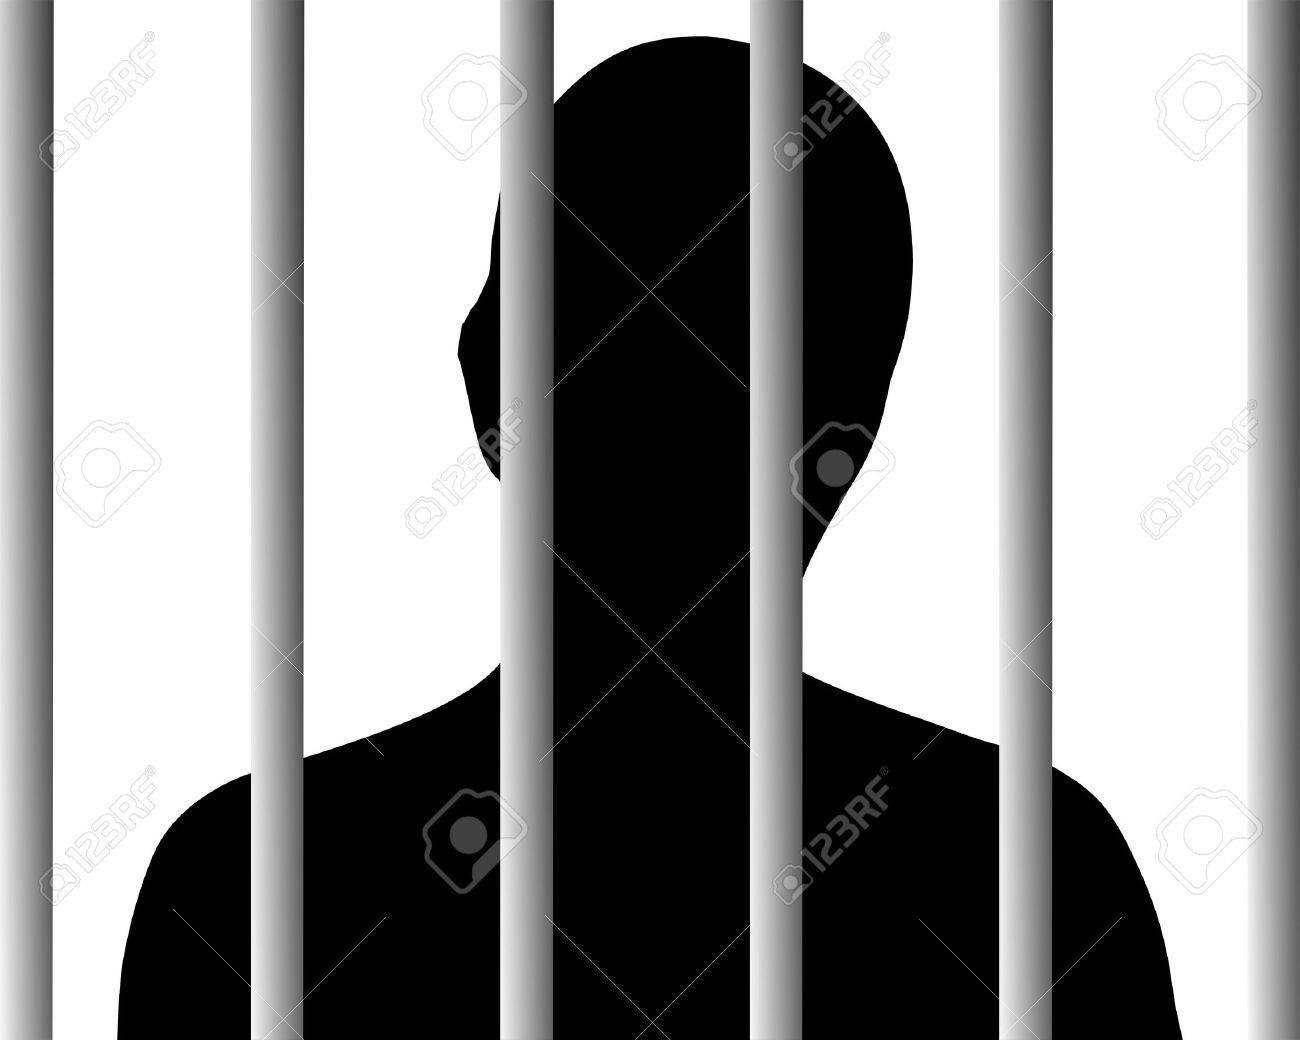 Human behind bars Stock Vector - 9492056